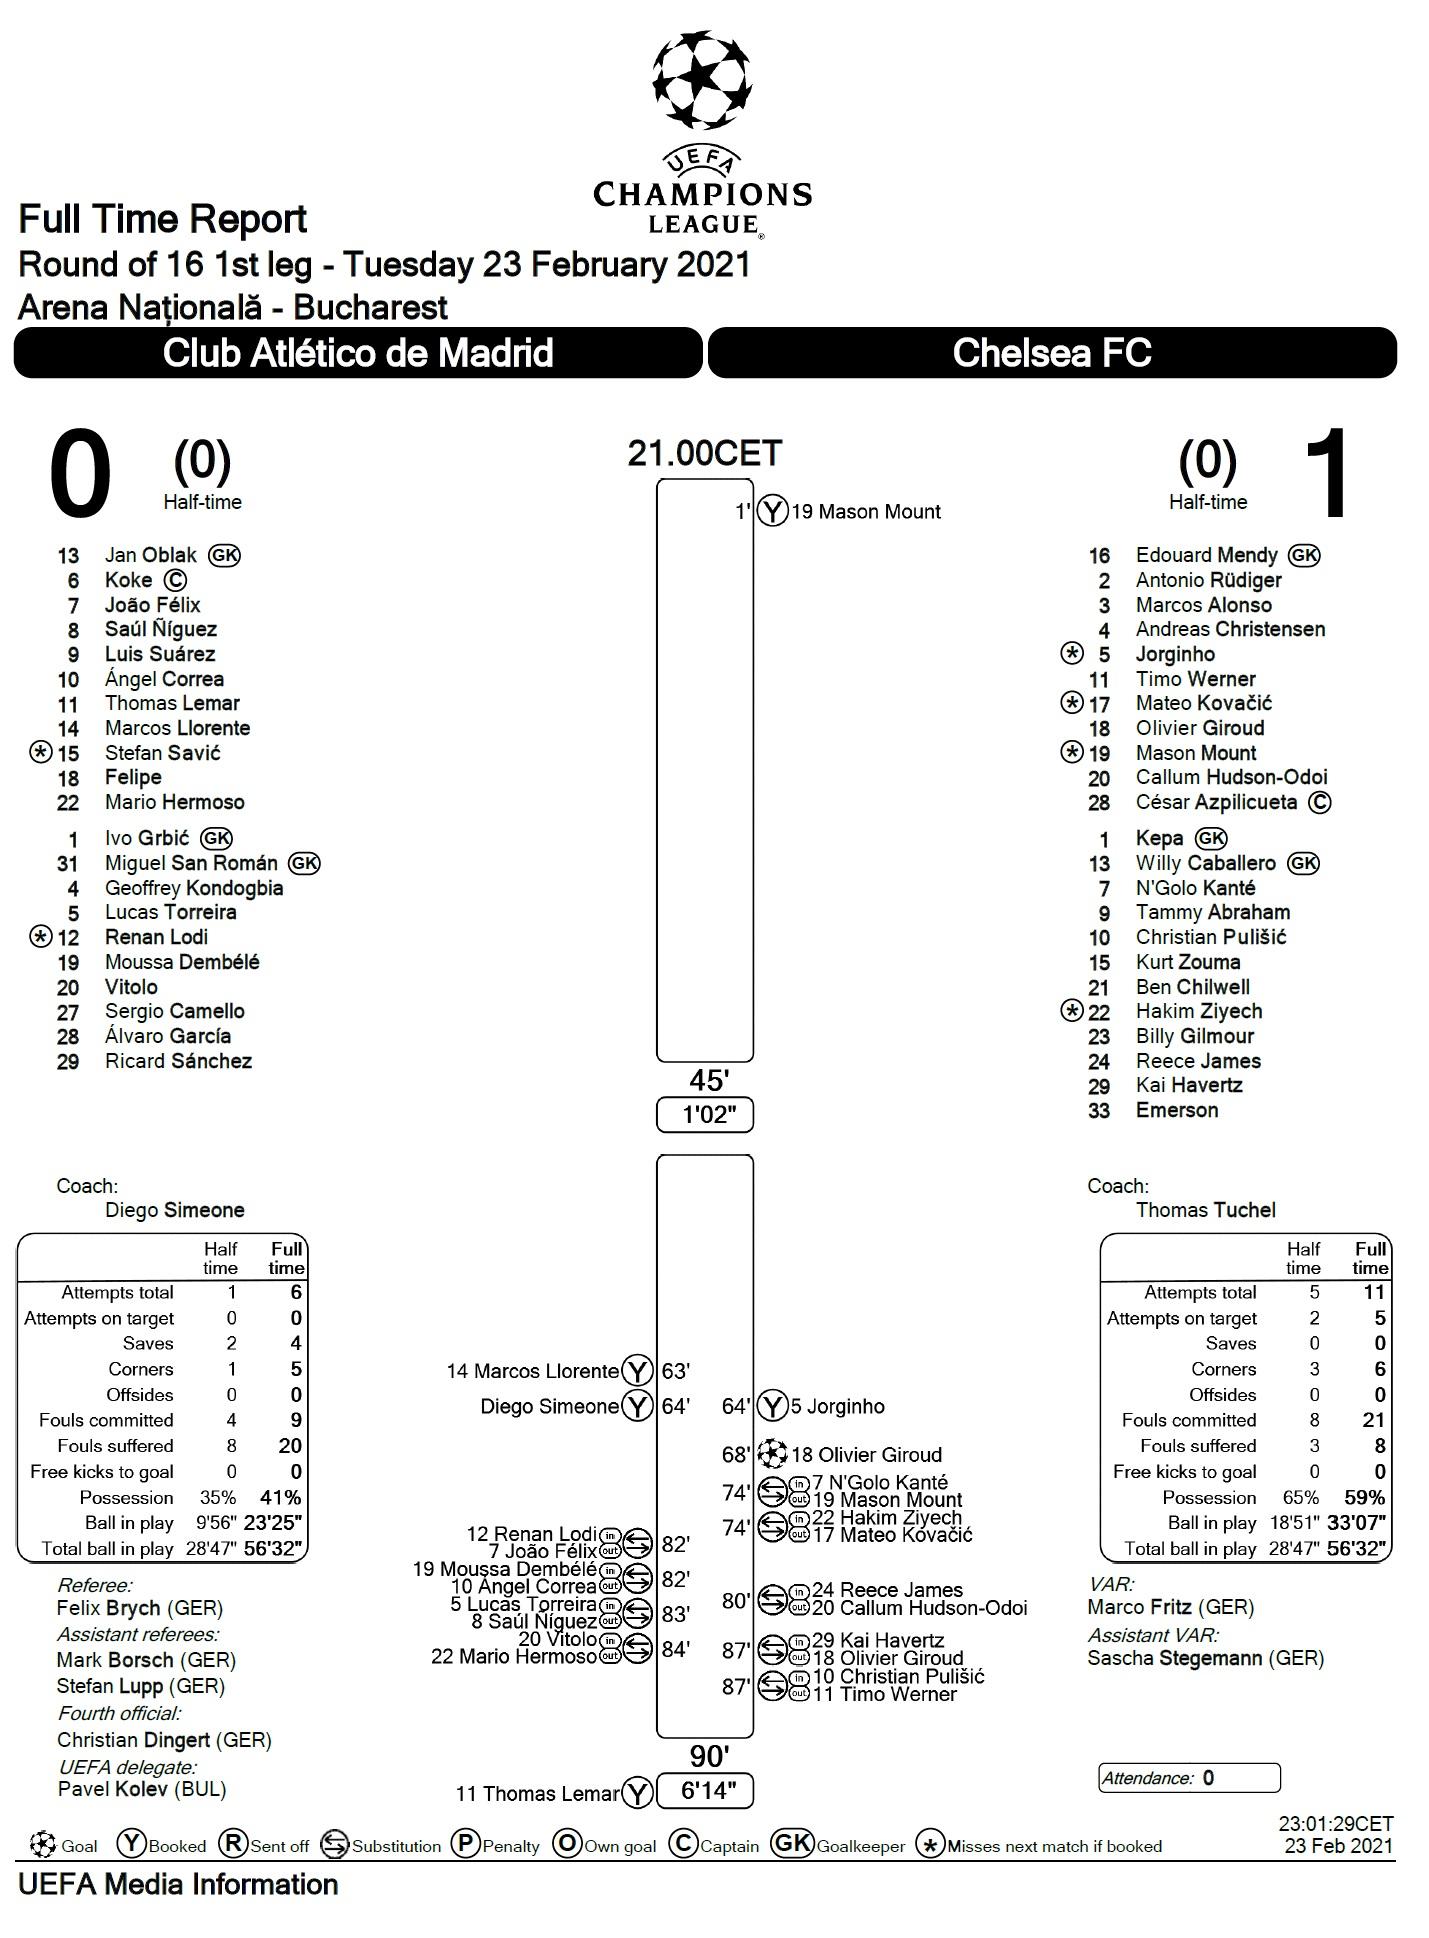 Атлетико (Испания) - Челси (Англия) 0:1